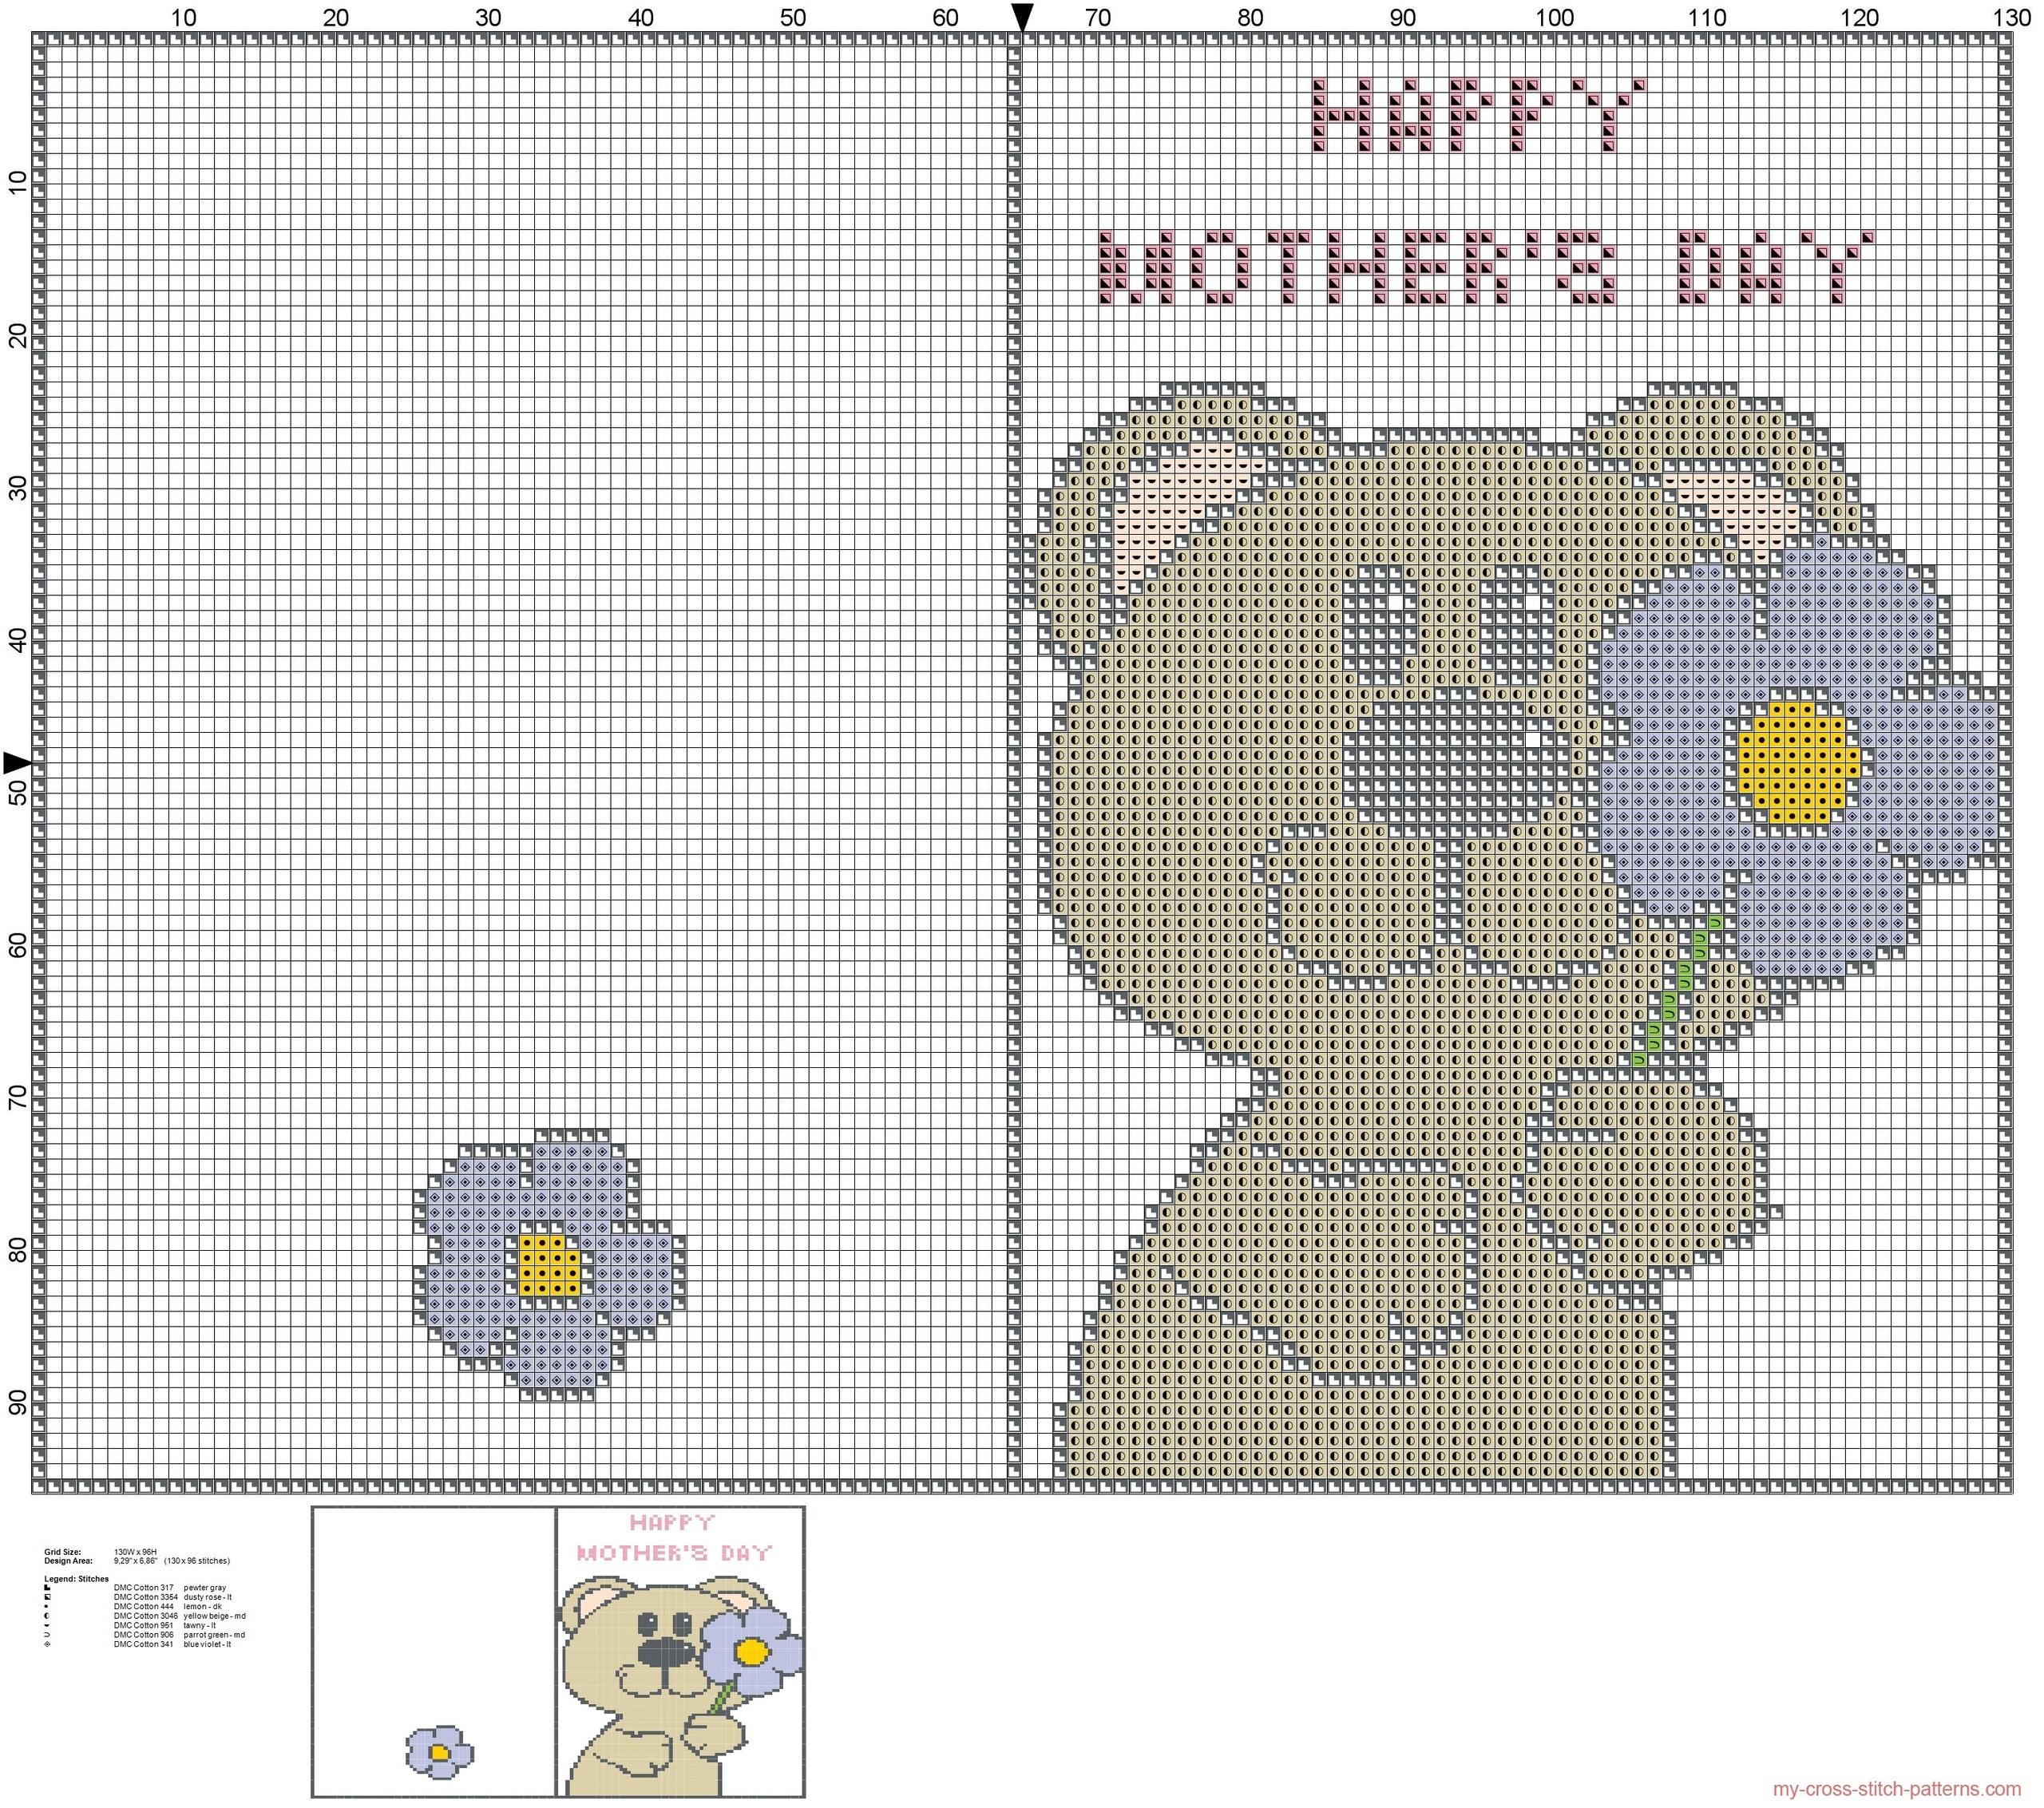 card_happy_mothers_day_cross_stitch_pattern_free